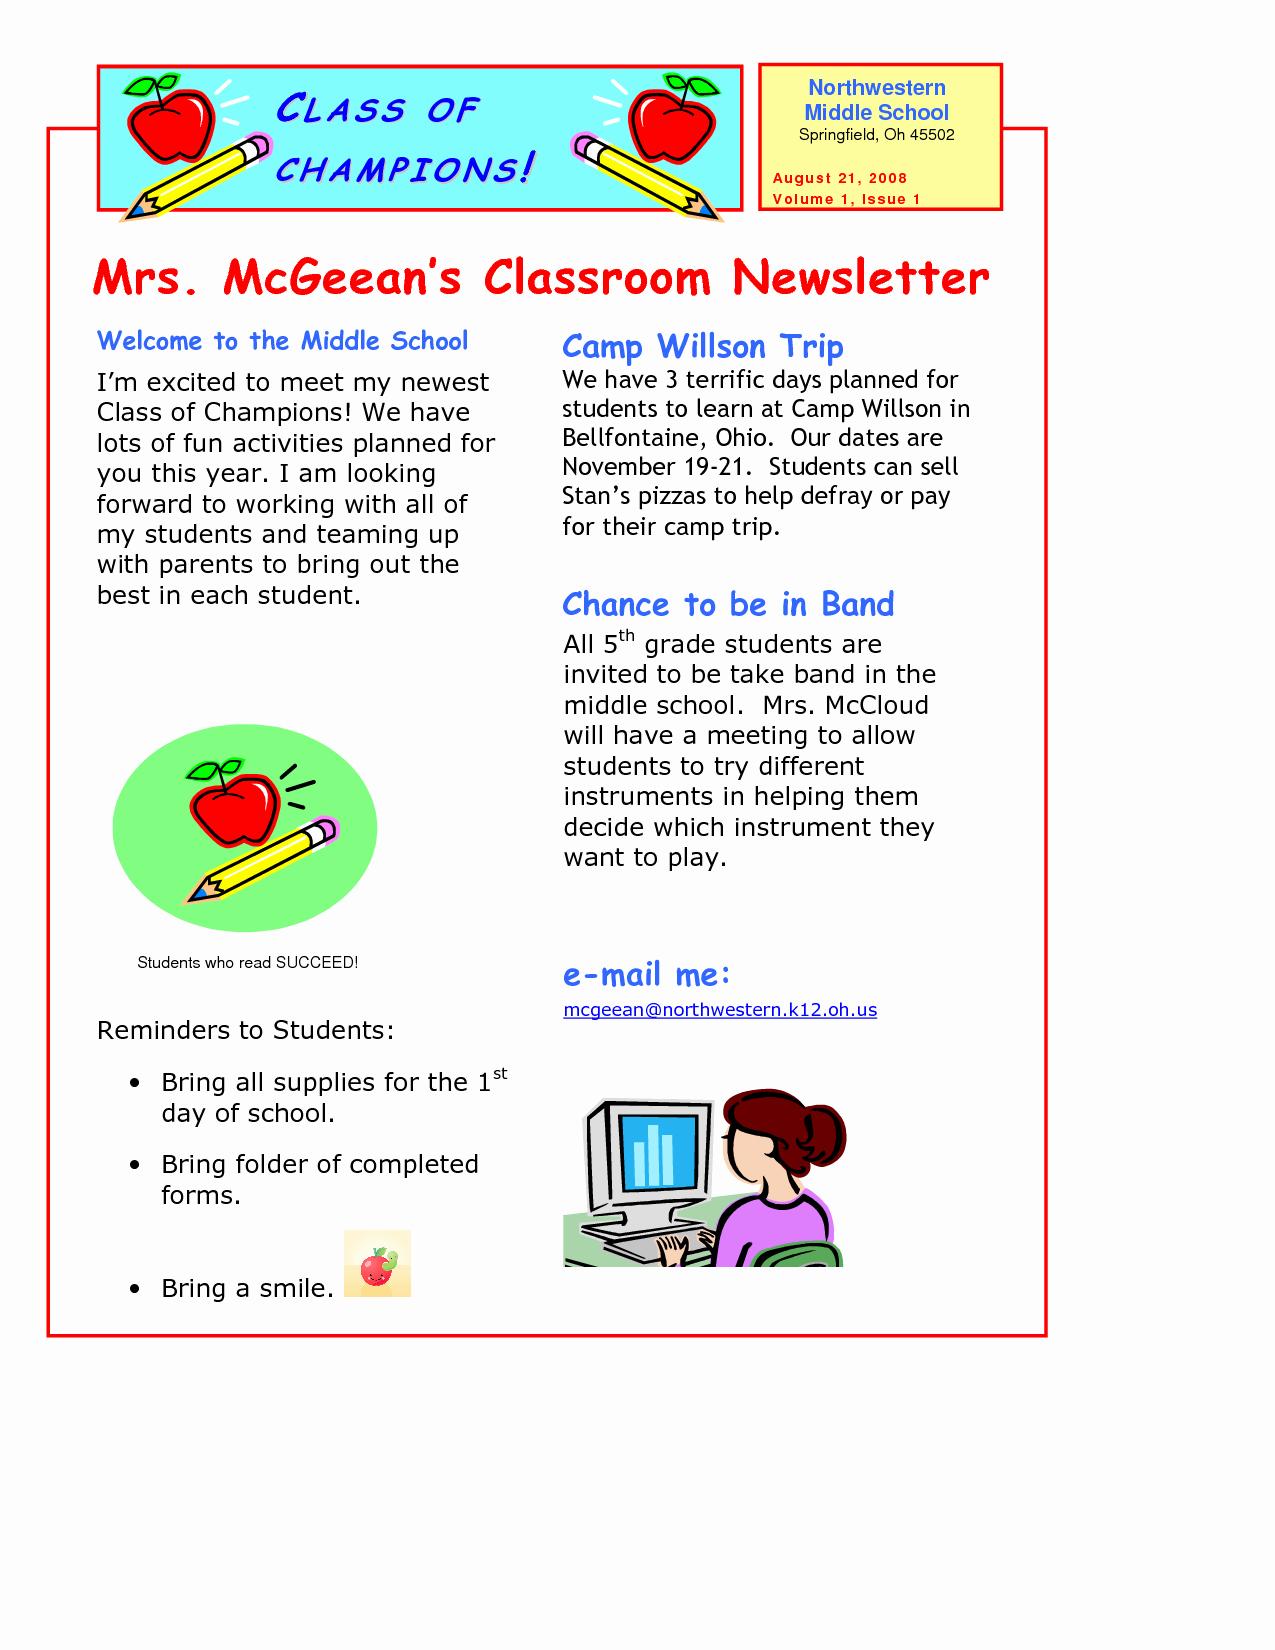 School Newsletter Templates Free Elegant Classroom Newsletter Template